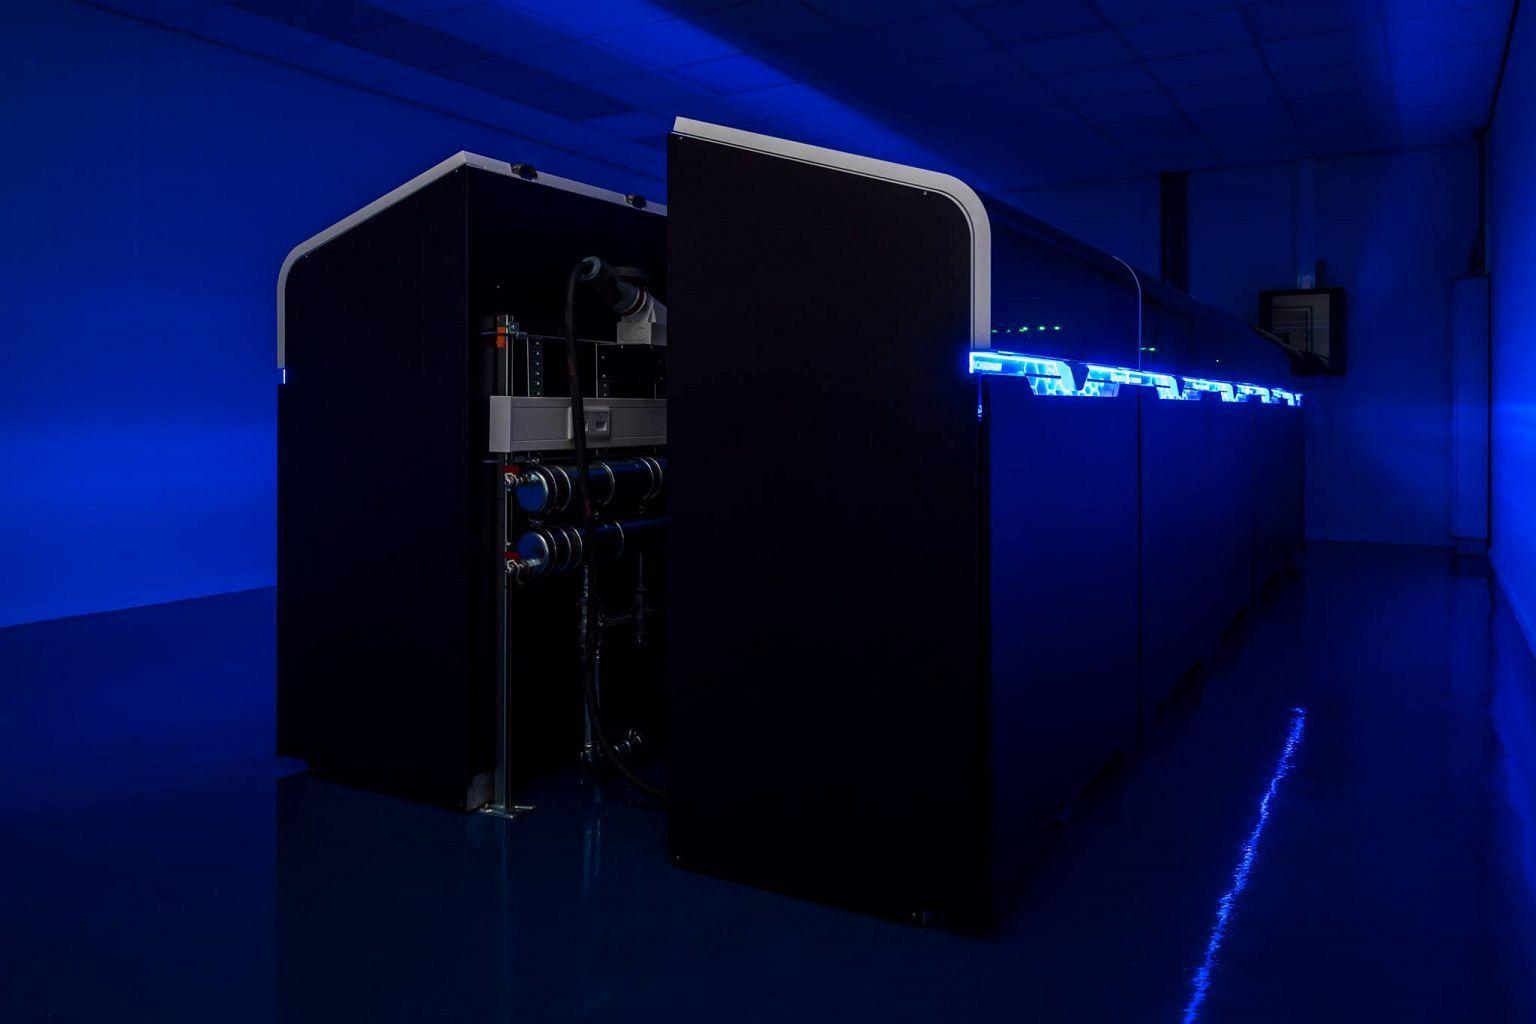 Asperitas Data Center Technology